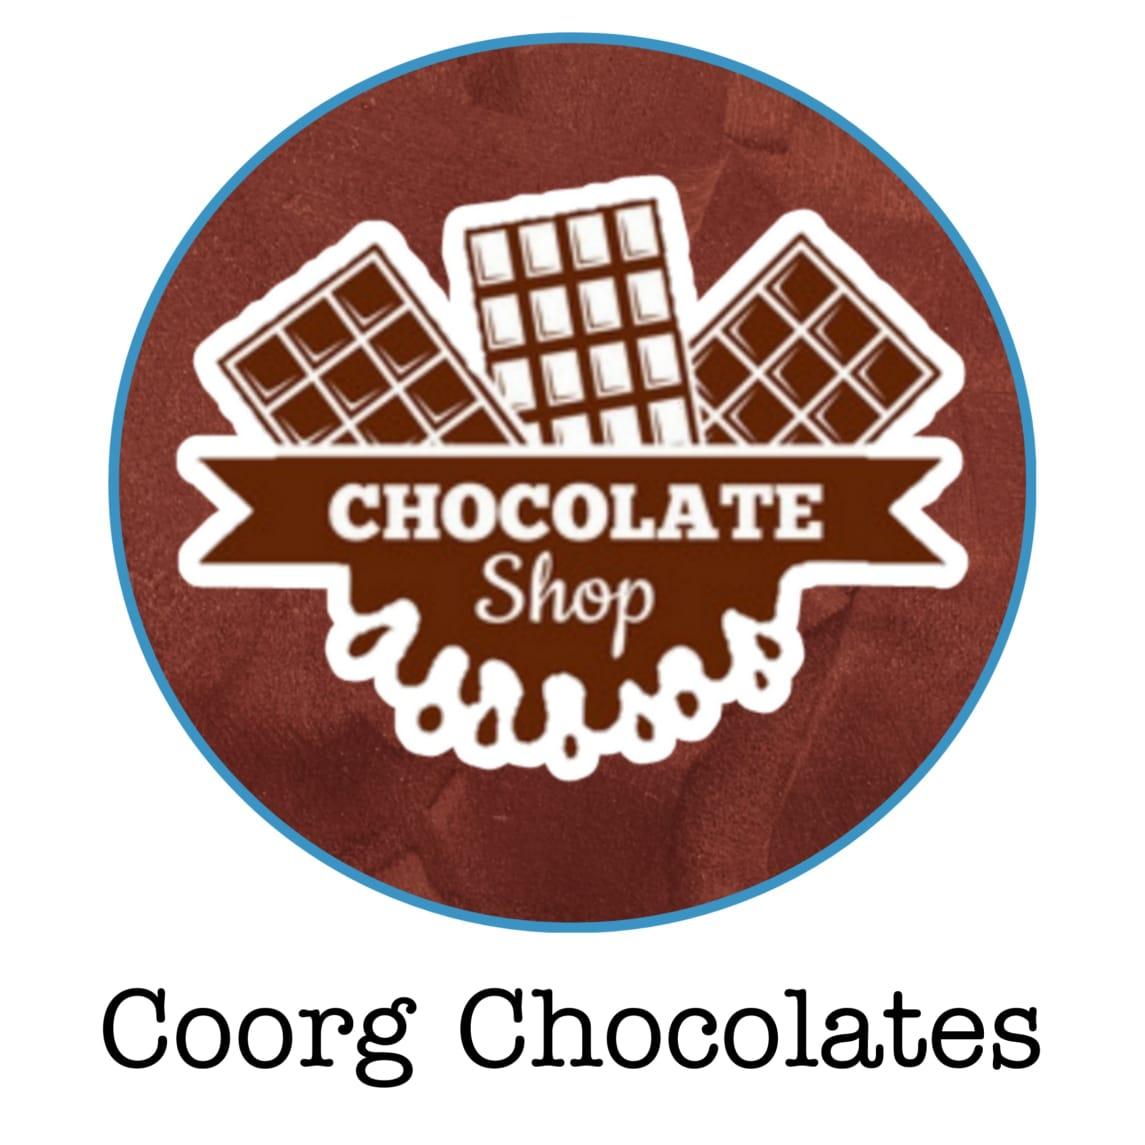 Coorg Chocolates